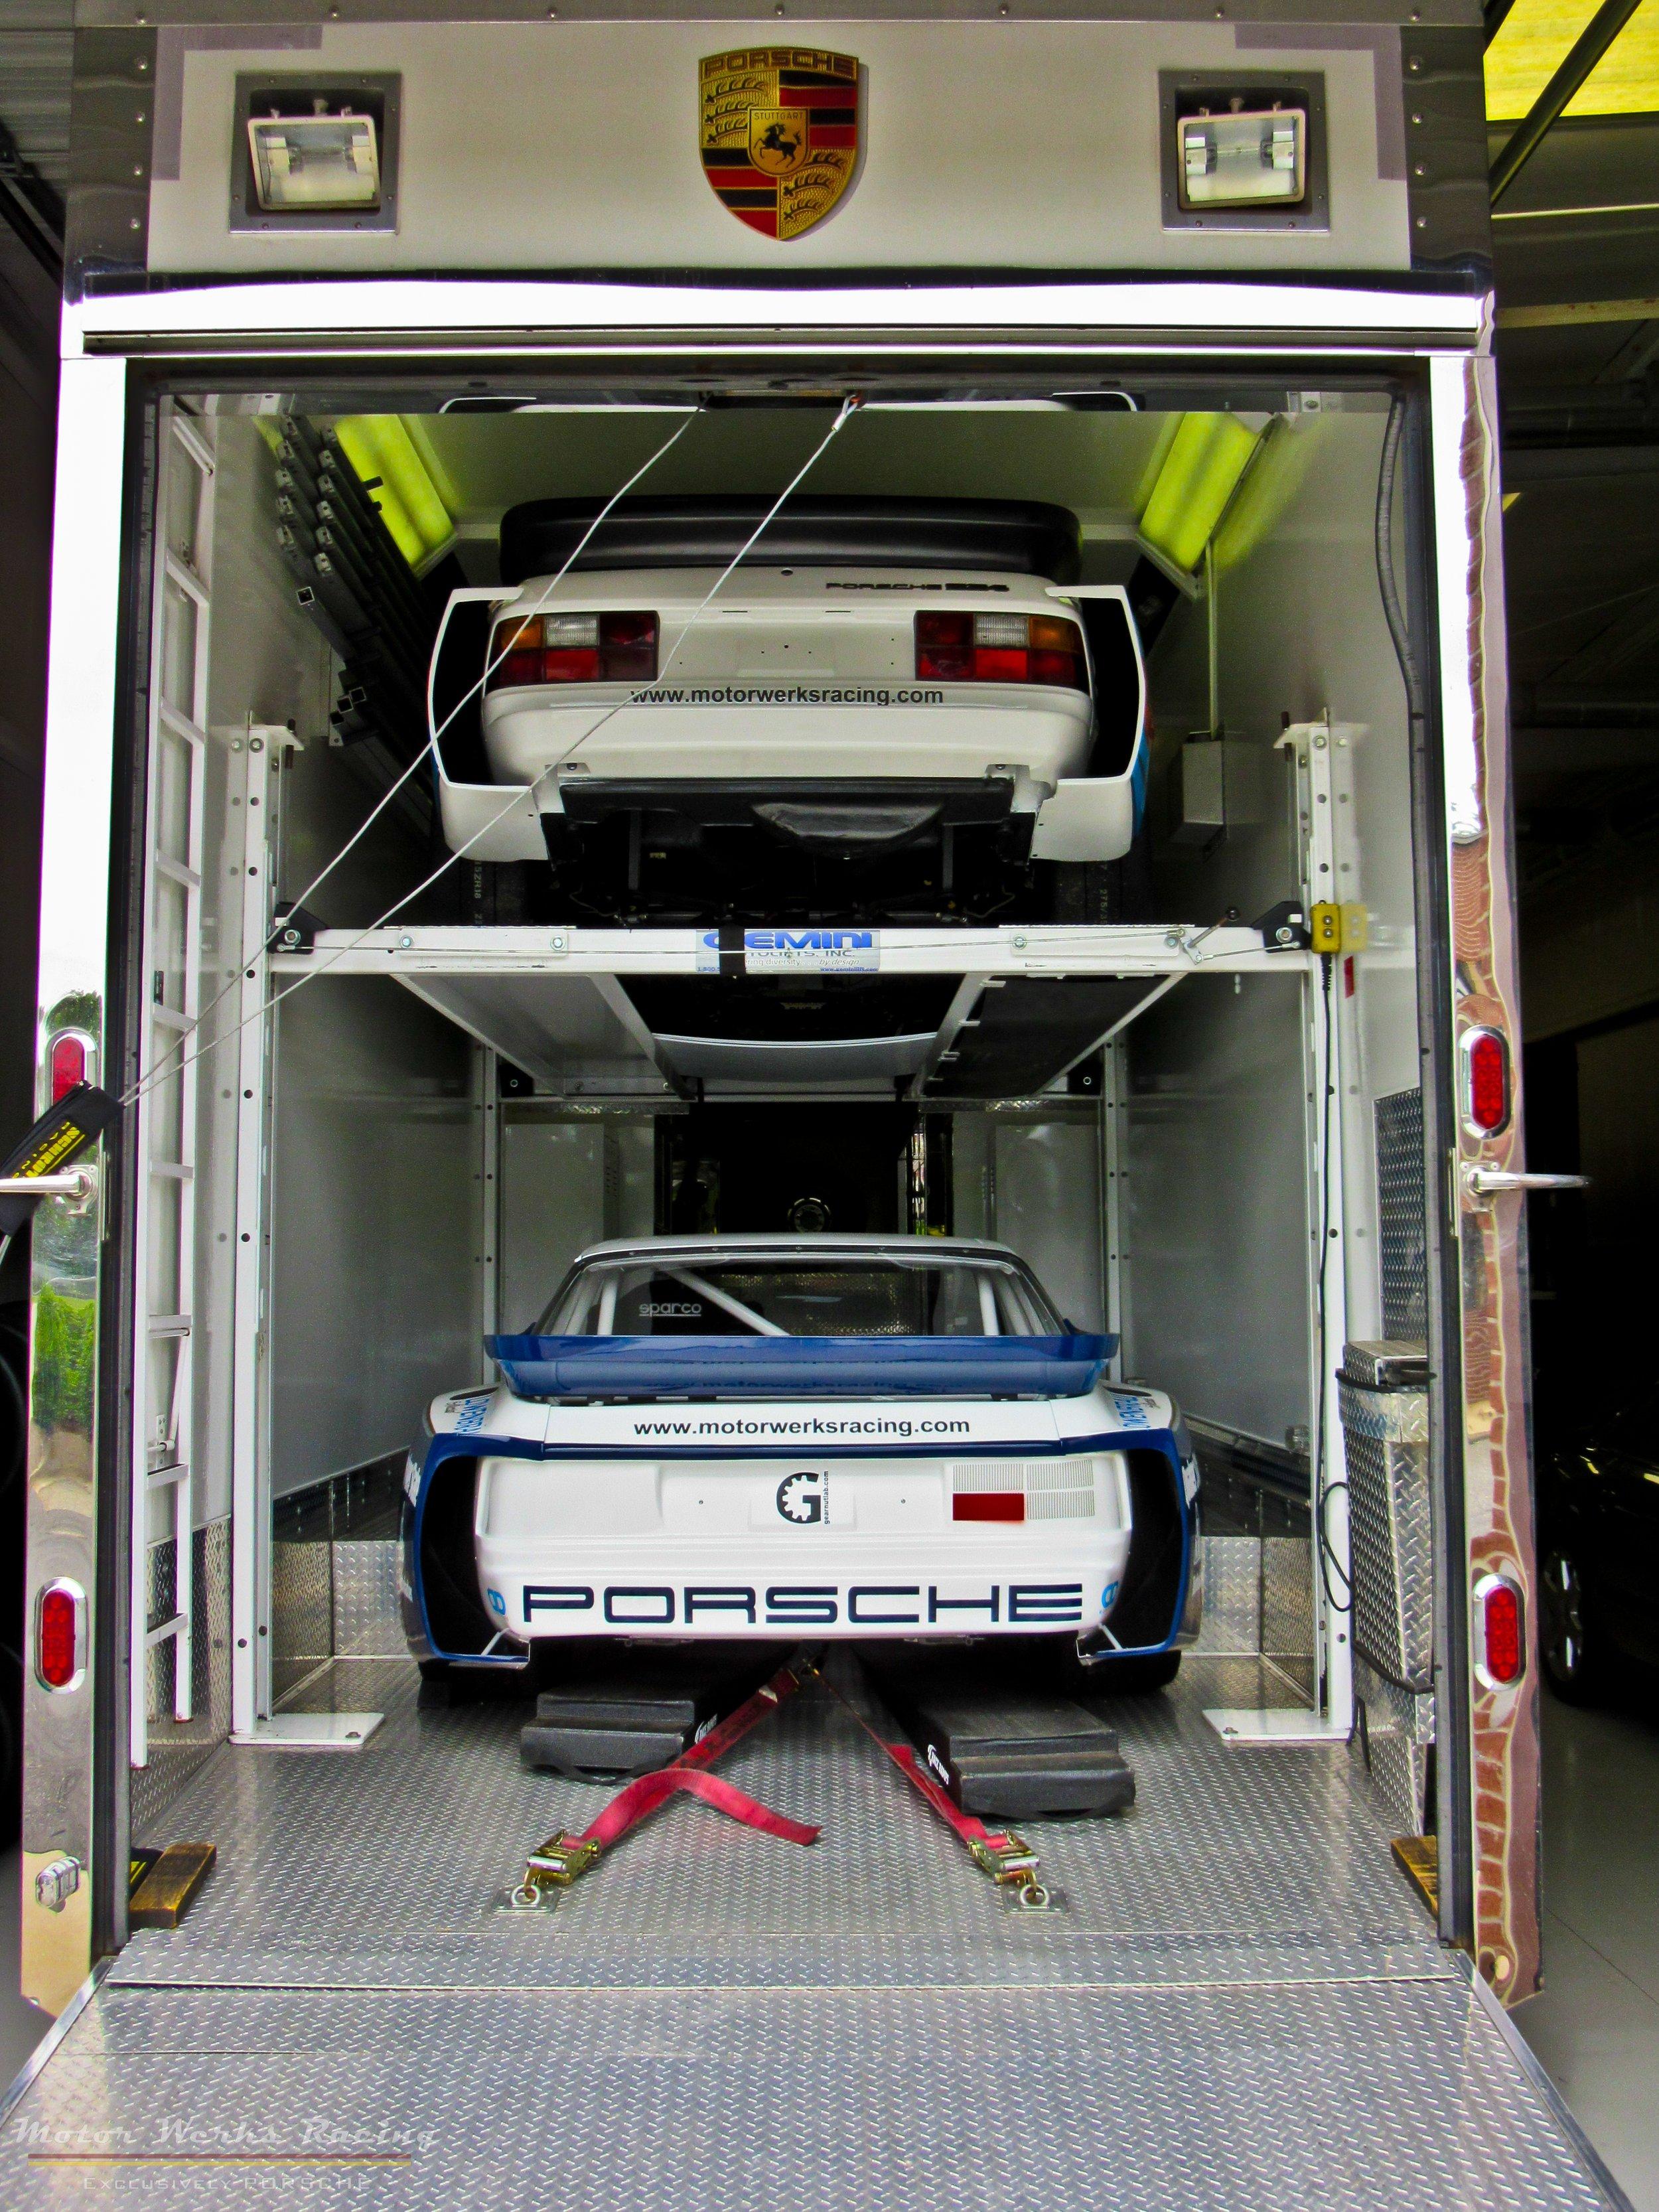 Motor Werks Racing Porsche Track Support Service